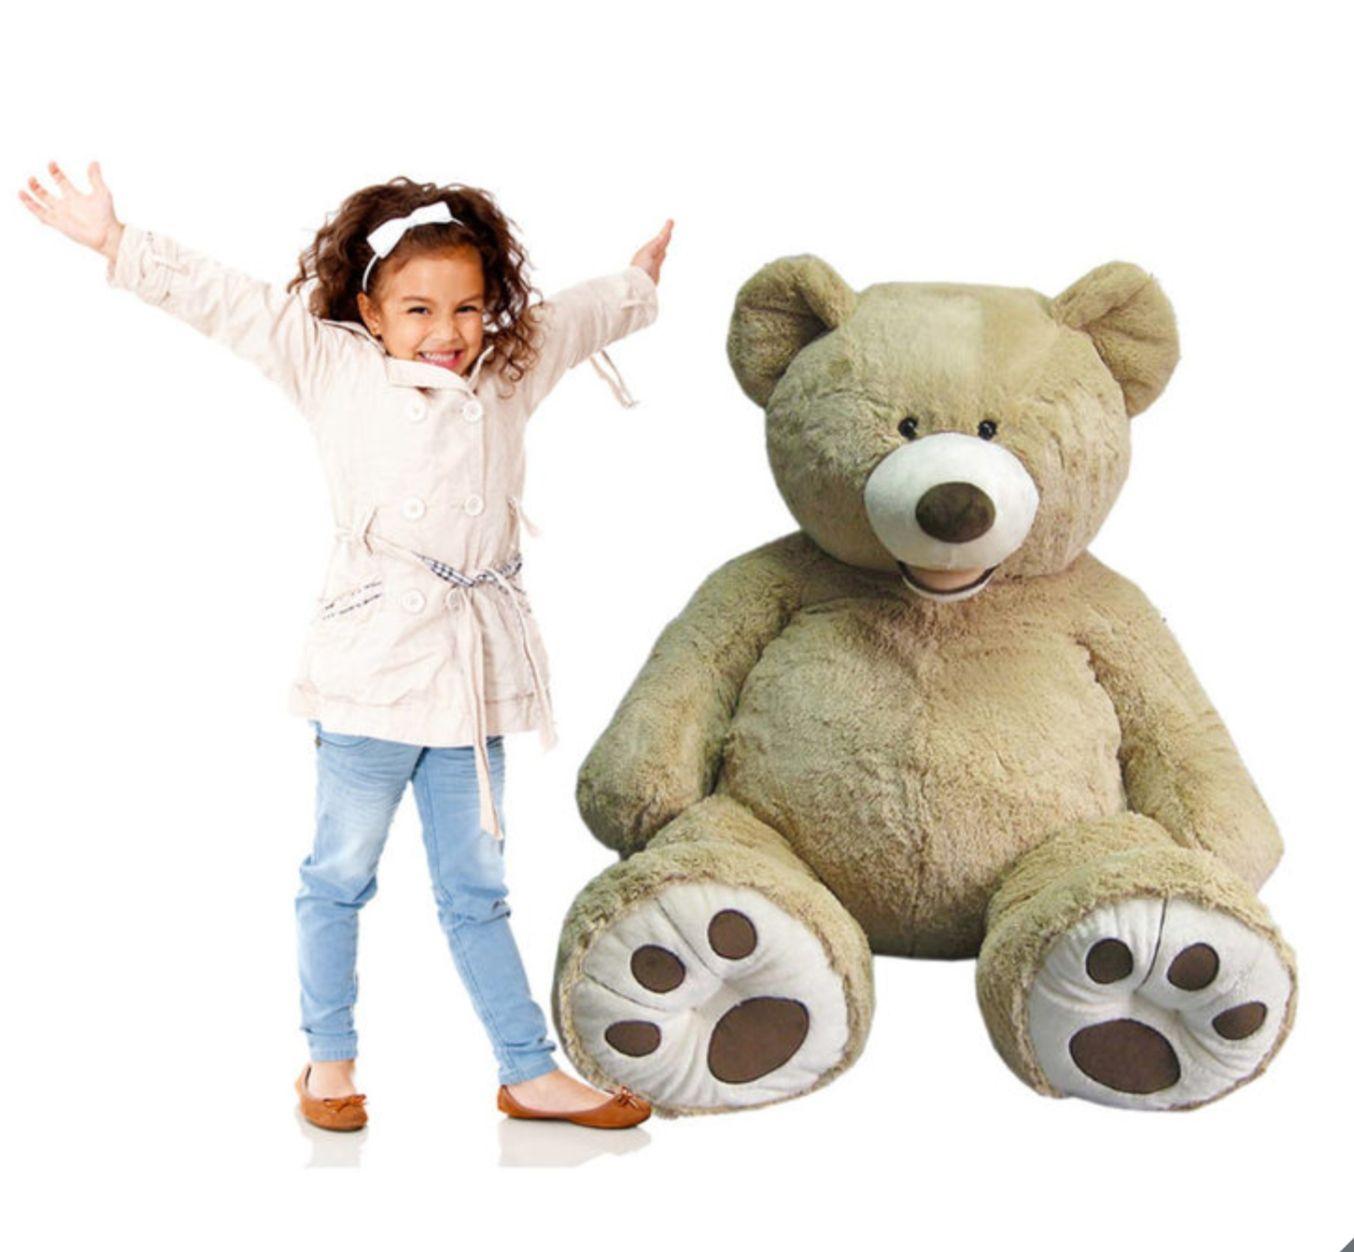 Hugfun 53in Teddy bear £27.58 Costco - Wembley